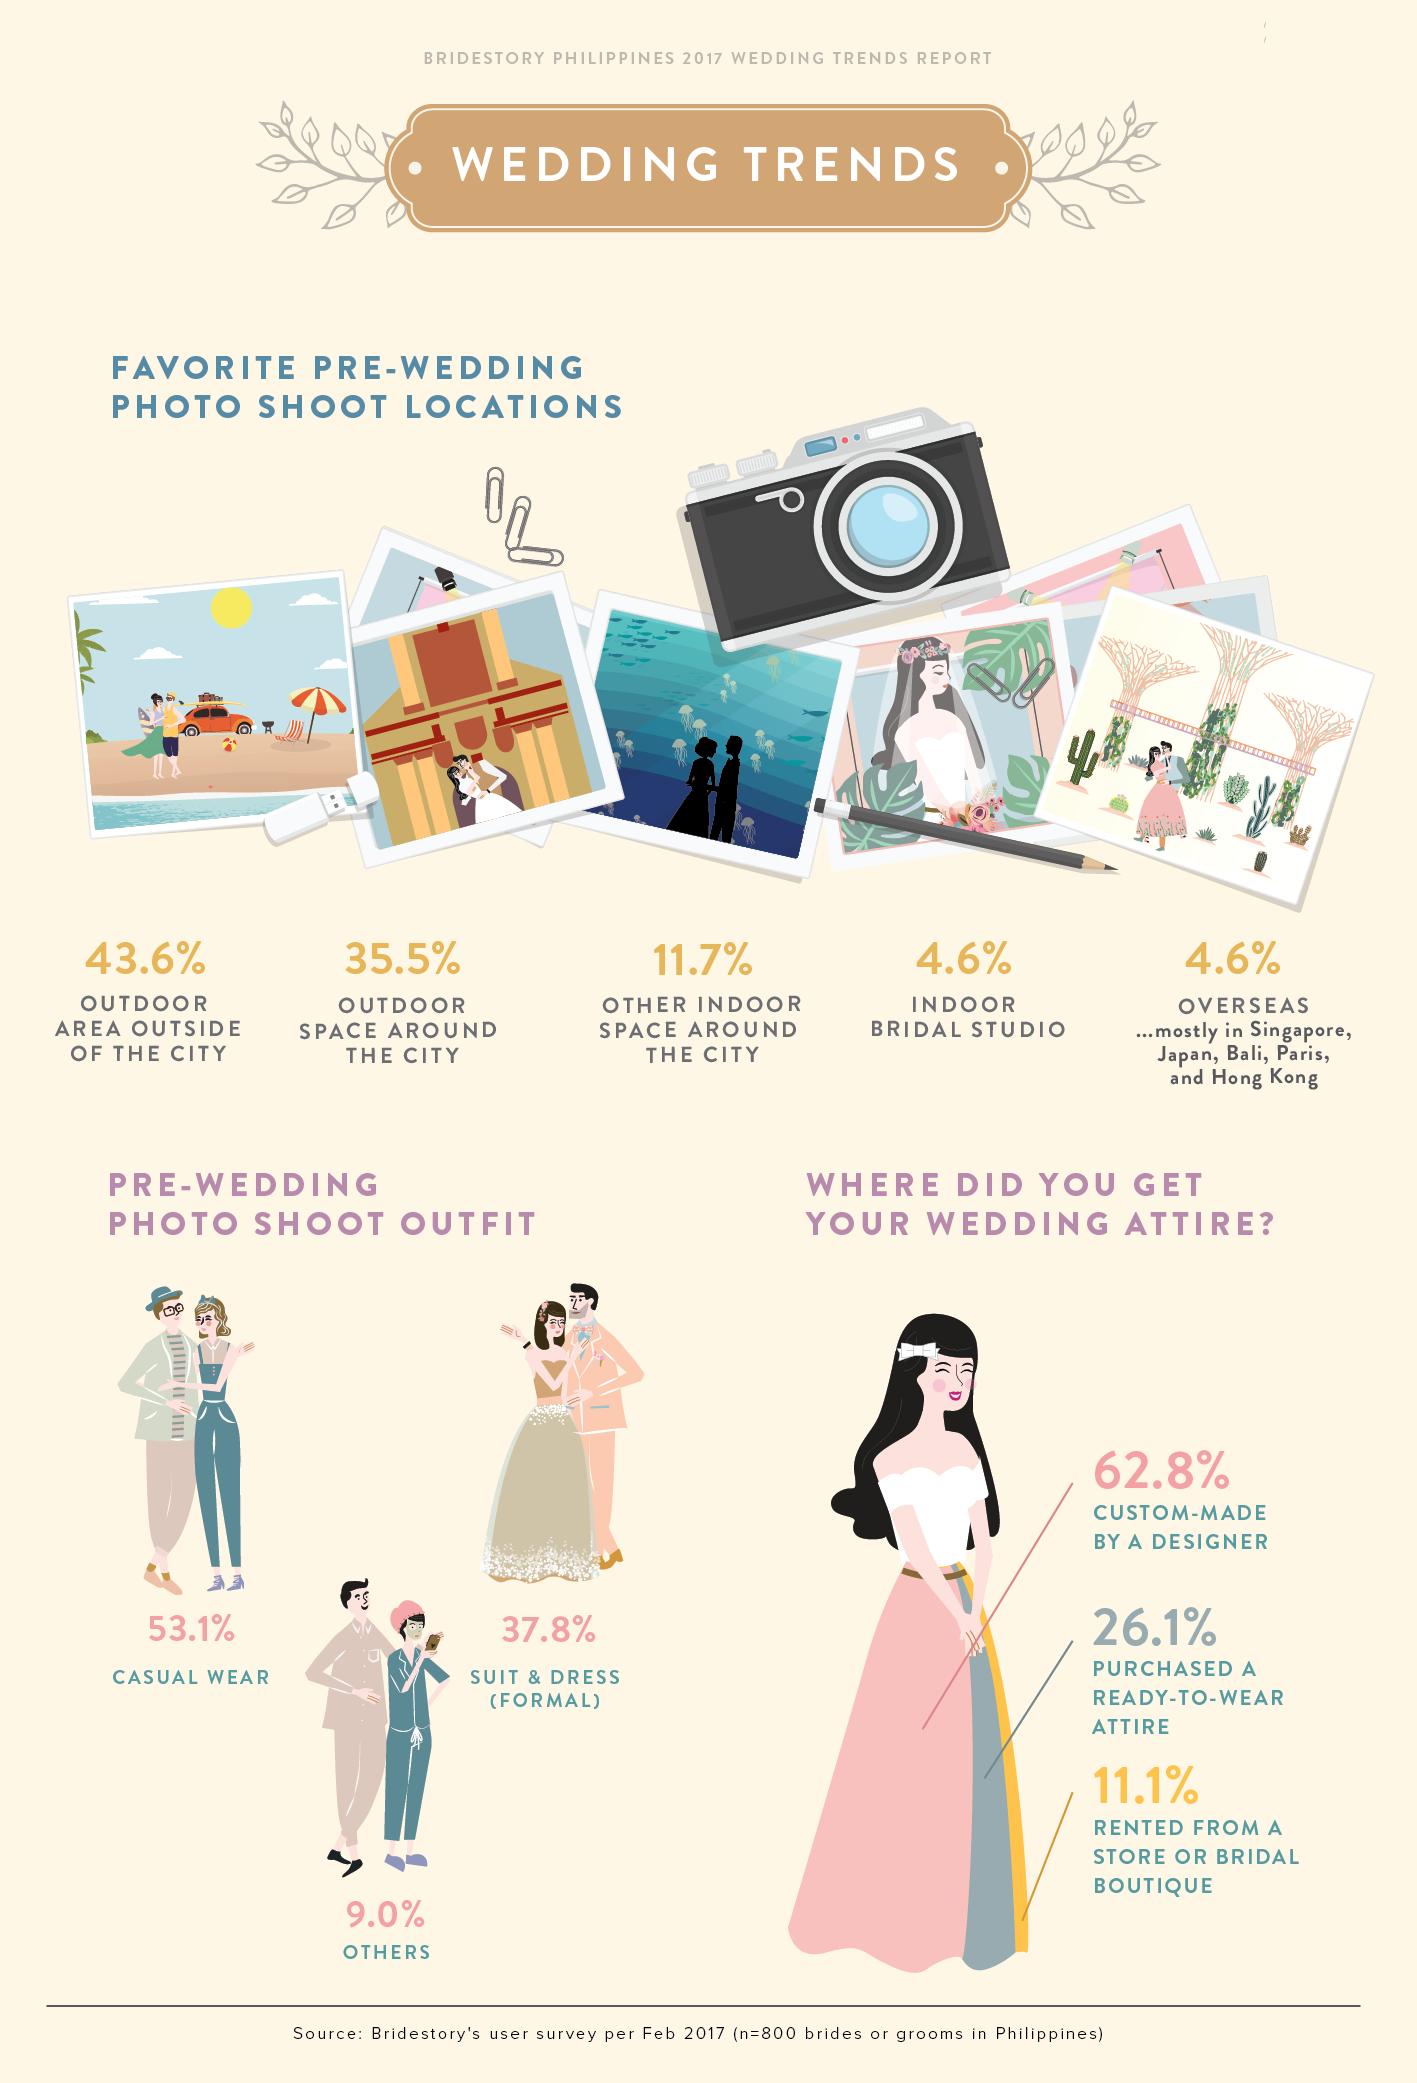 2017 Philippines Wedding Trends Report by Bridestory - Bridestory Blog